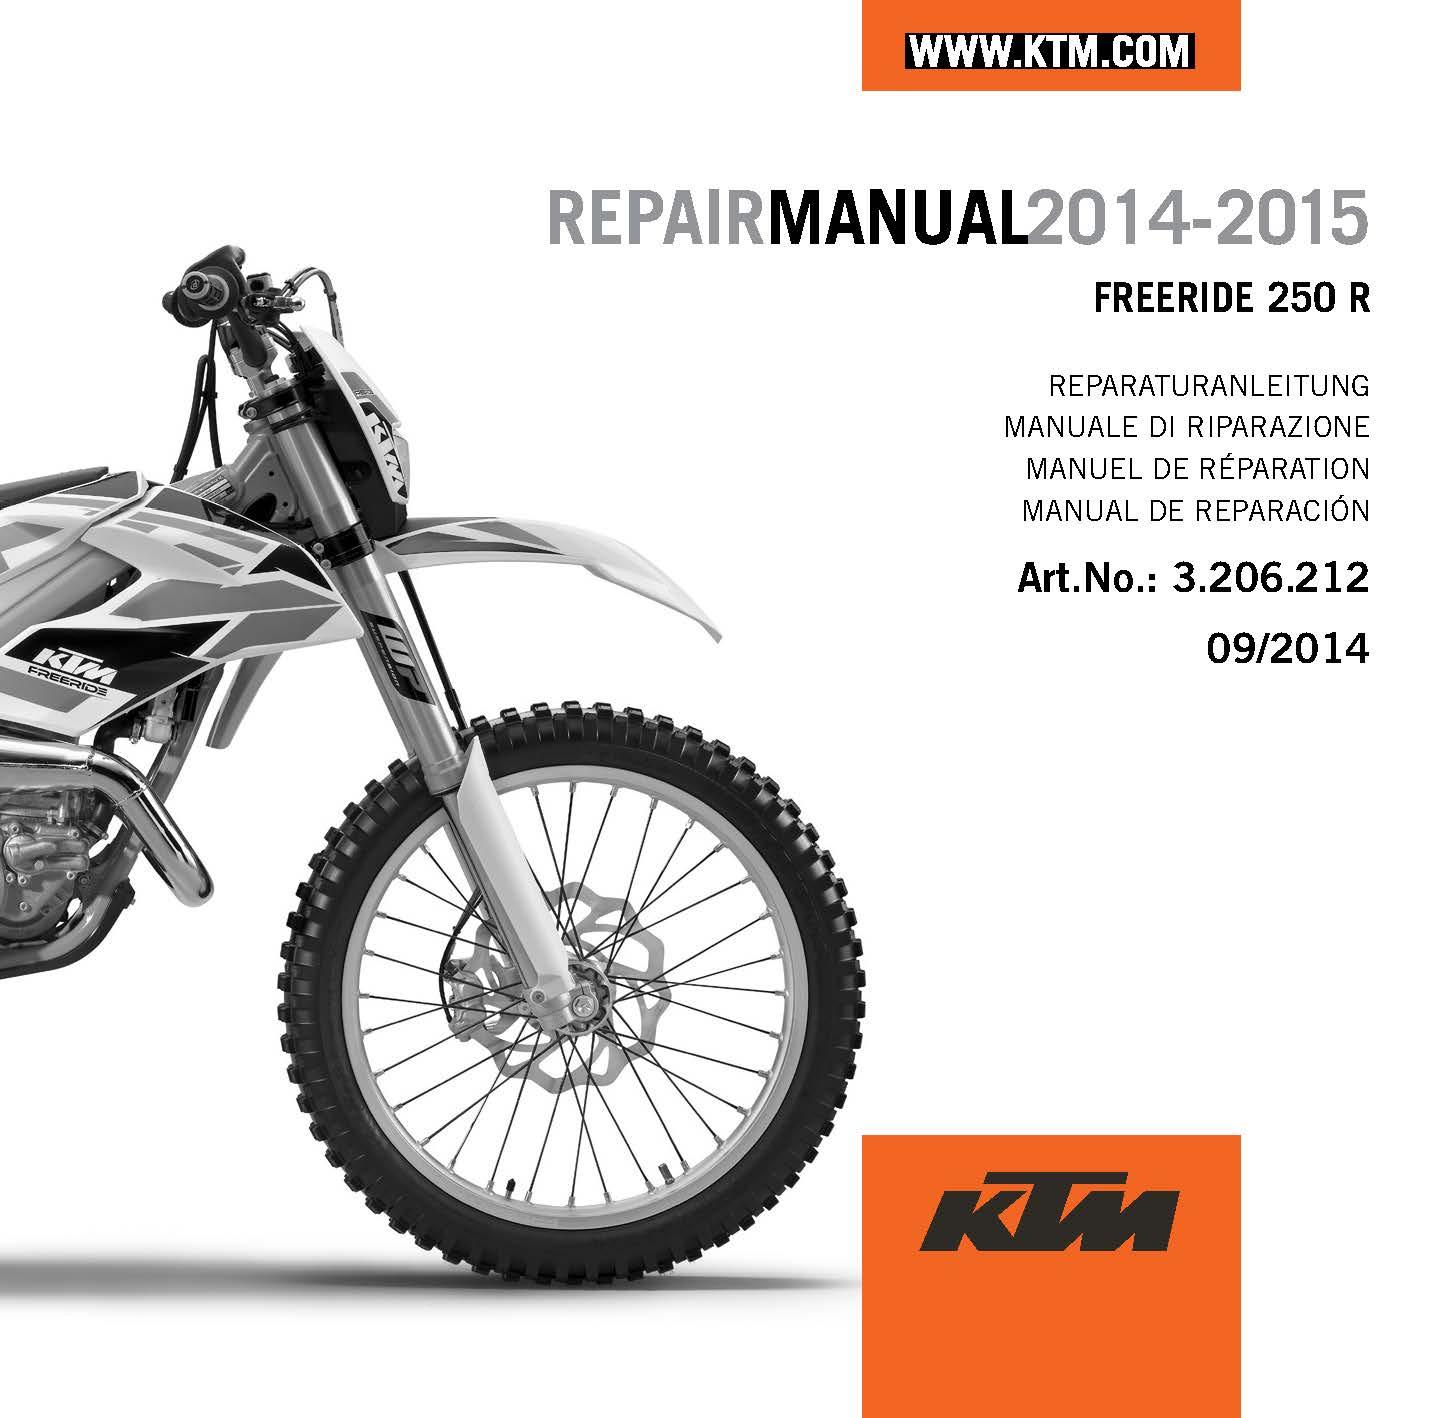 ktm spare parts manual motorview co rh motorview co Carbon Fiber Pipe Guard KTM Freeride 250R KTM Freeride 250R Tools